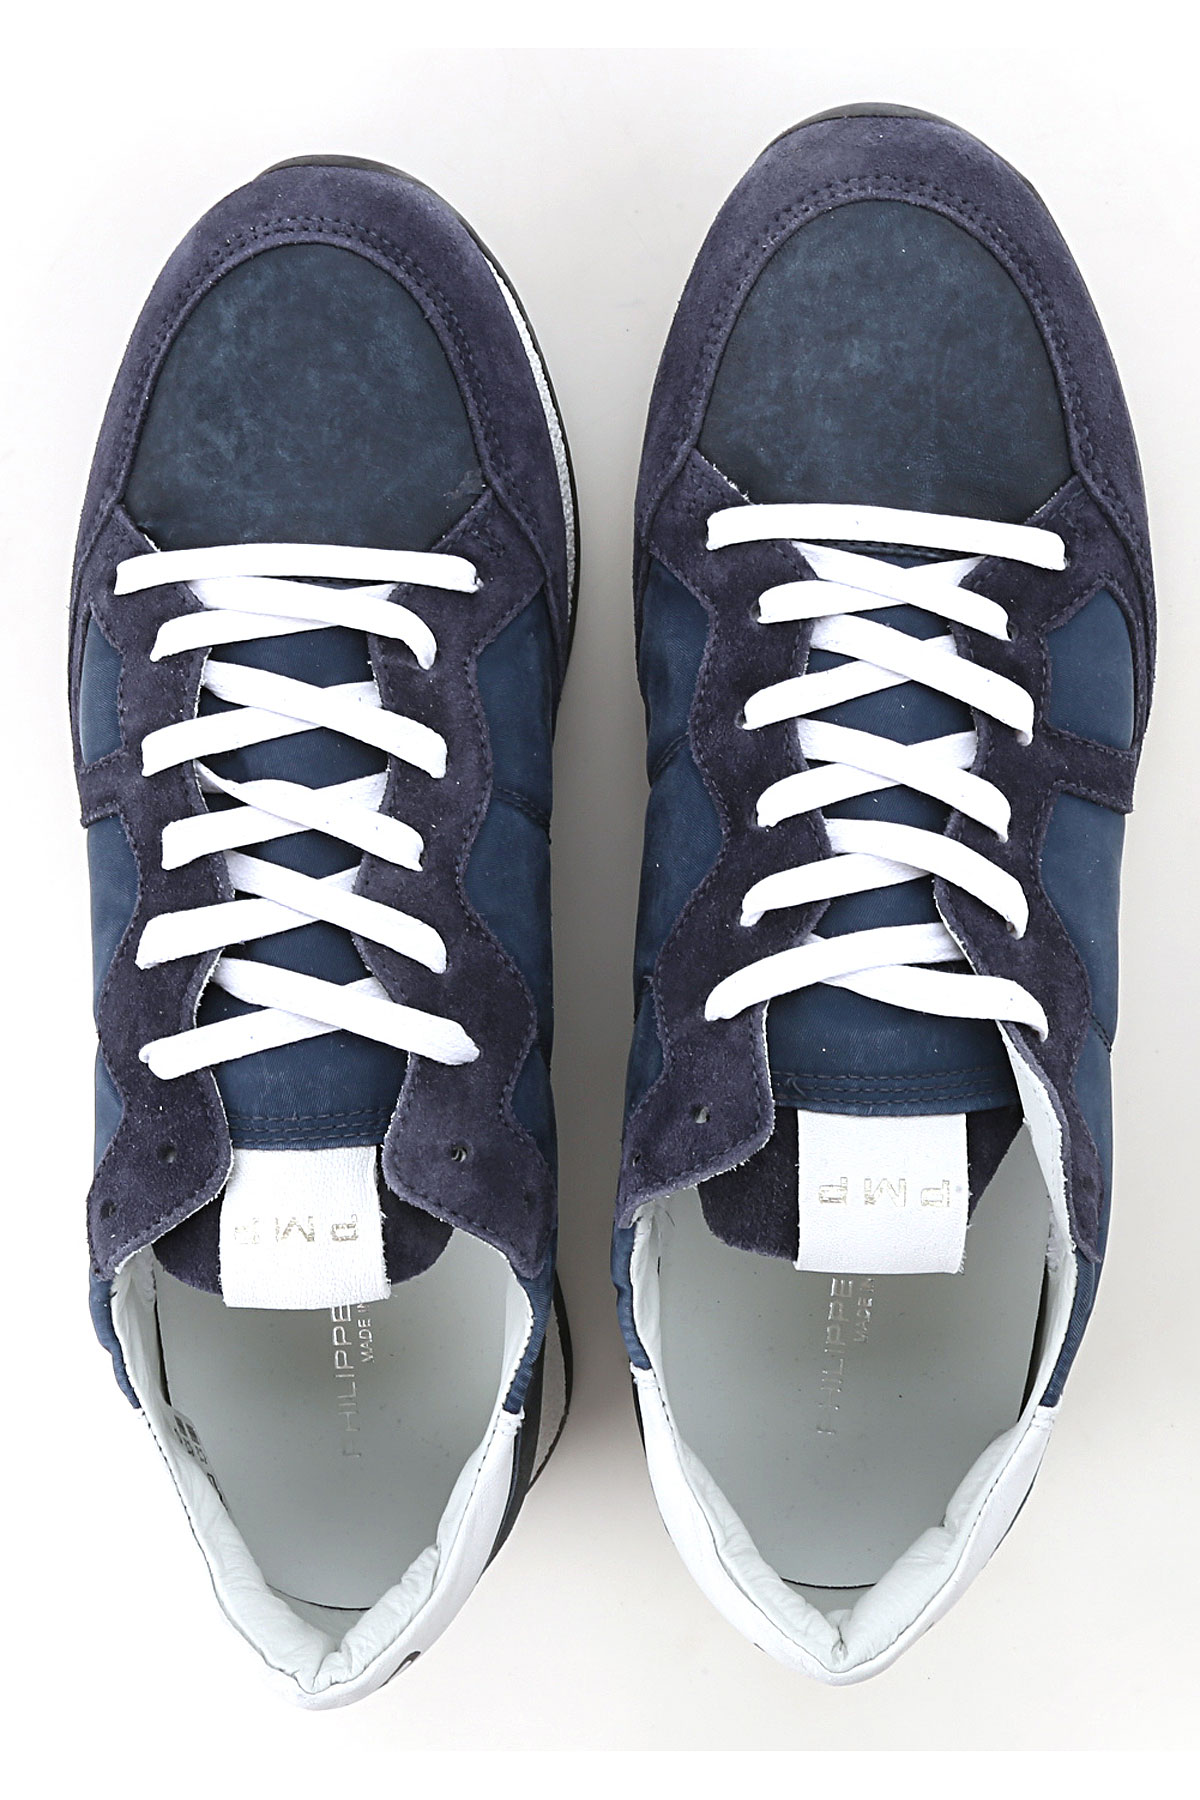 Philippe verano 2019 Océano Blanco Para Azul Model Zapatos Primavera Hombres Xg4ySXrcZ